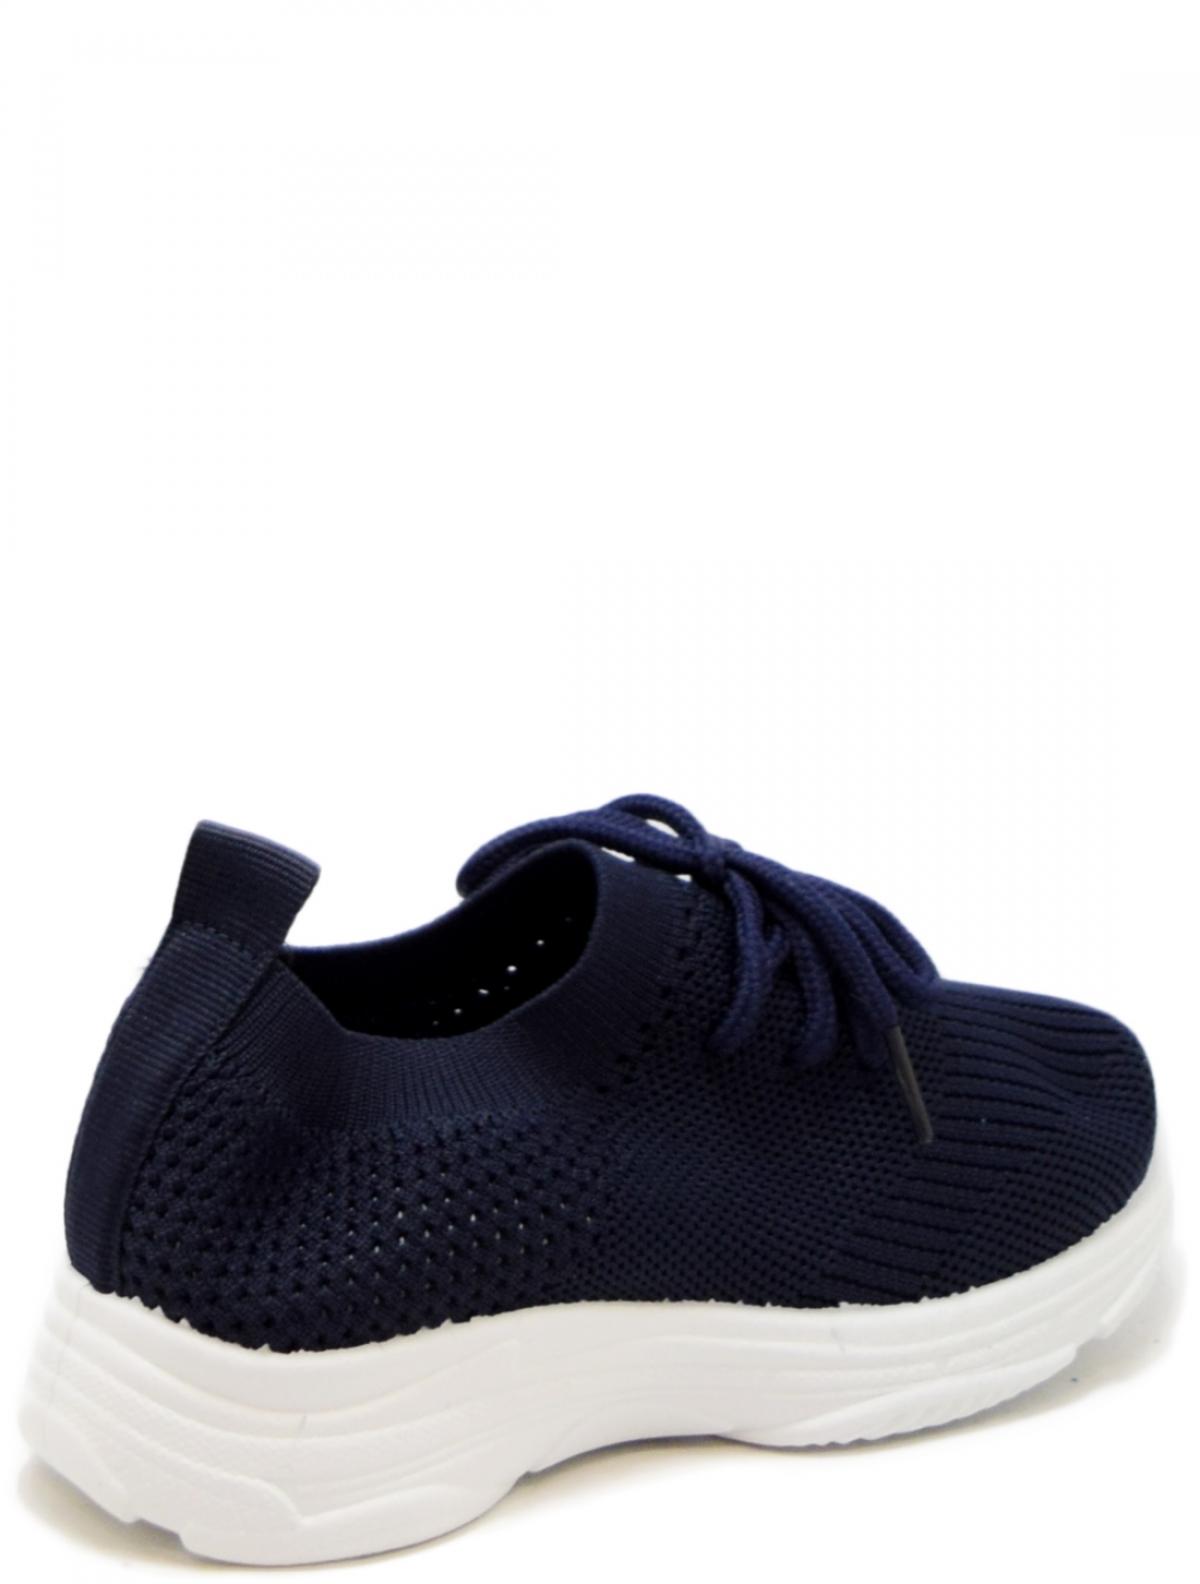 М.Мичи ML396C-7 кроссовки для девочки